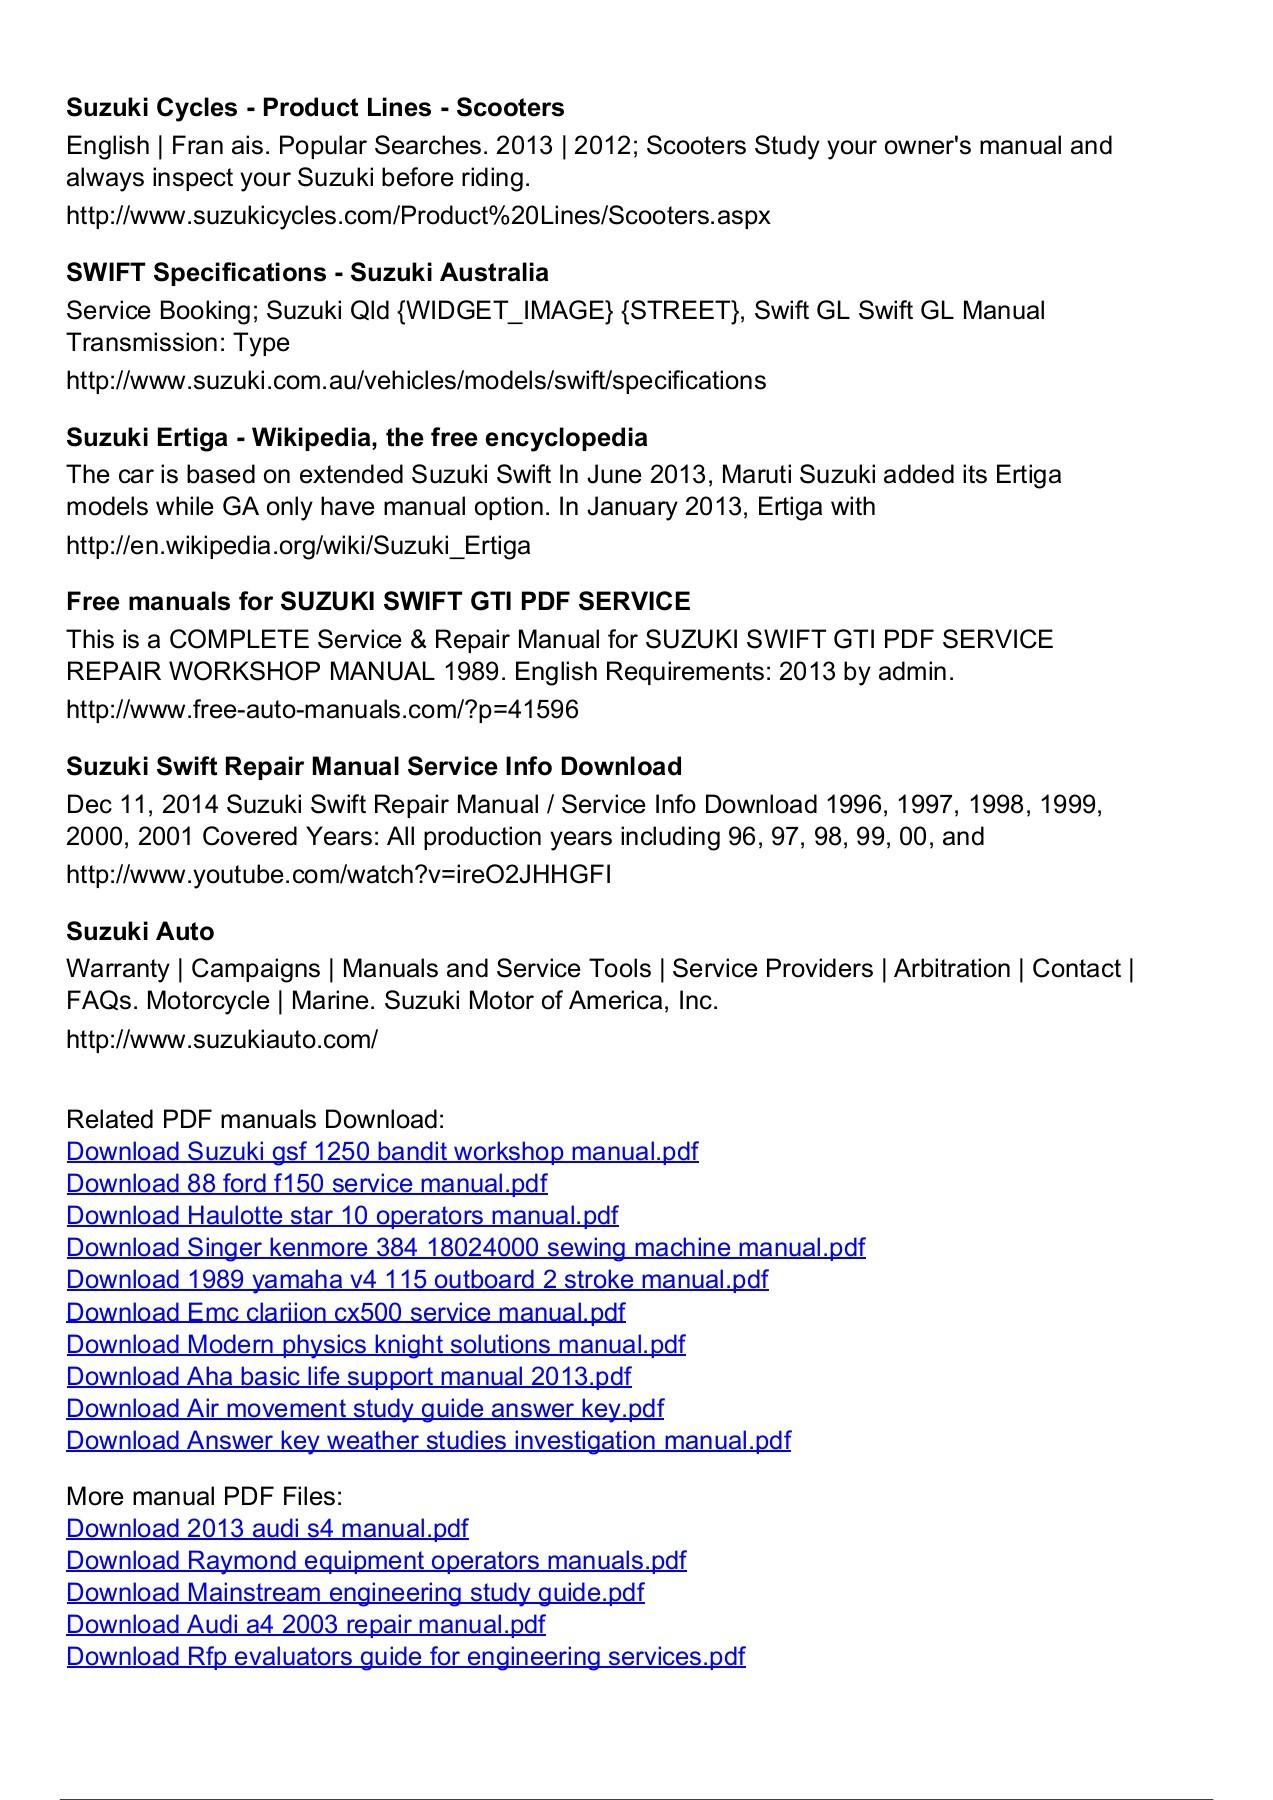 physiology study guide pdf rh lifechallengingrides catcafemad